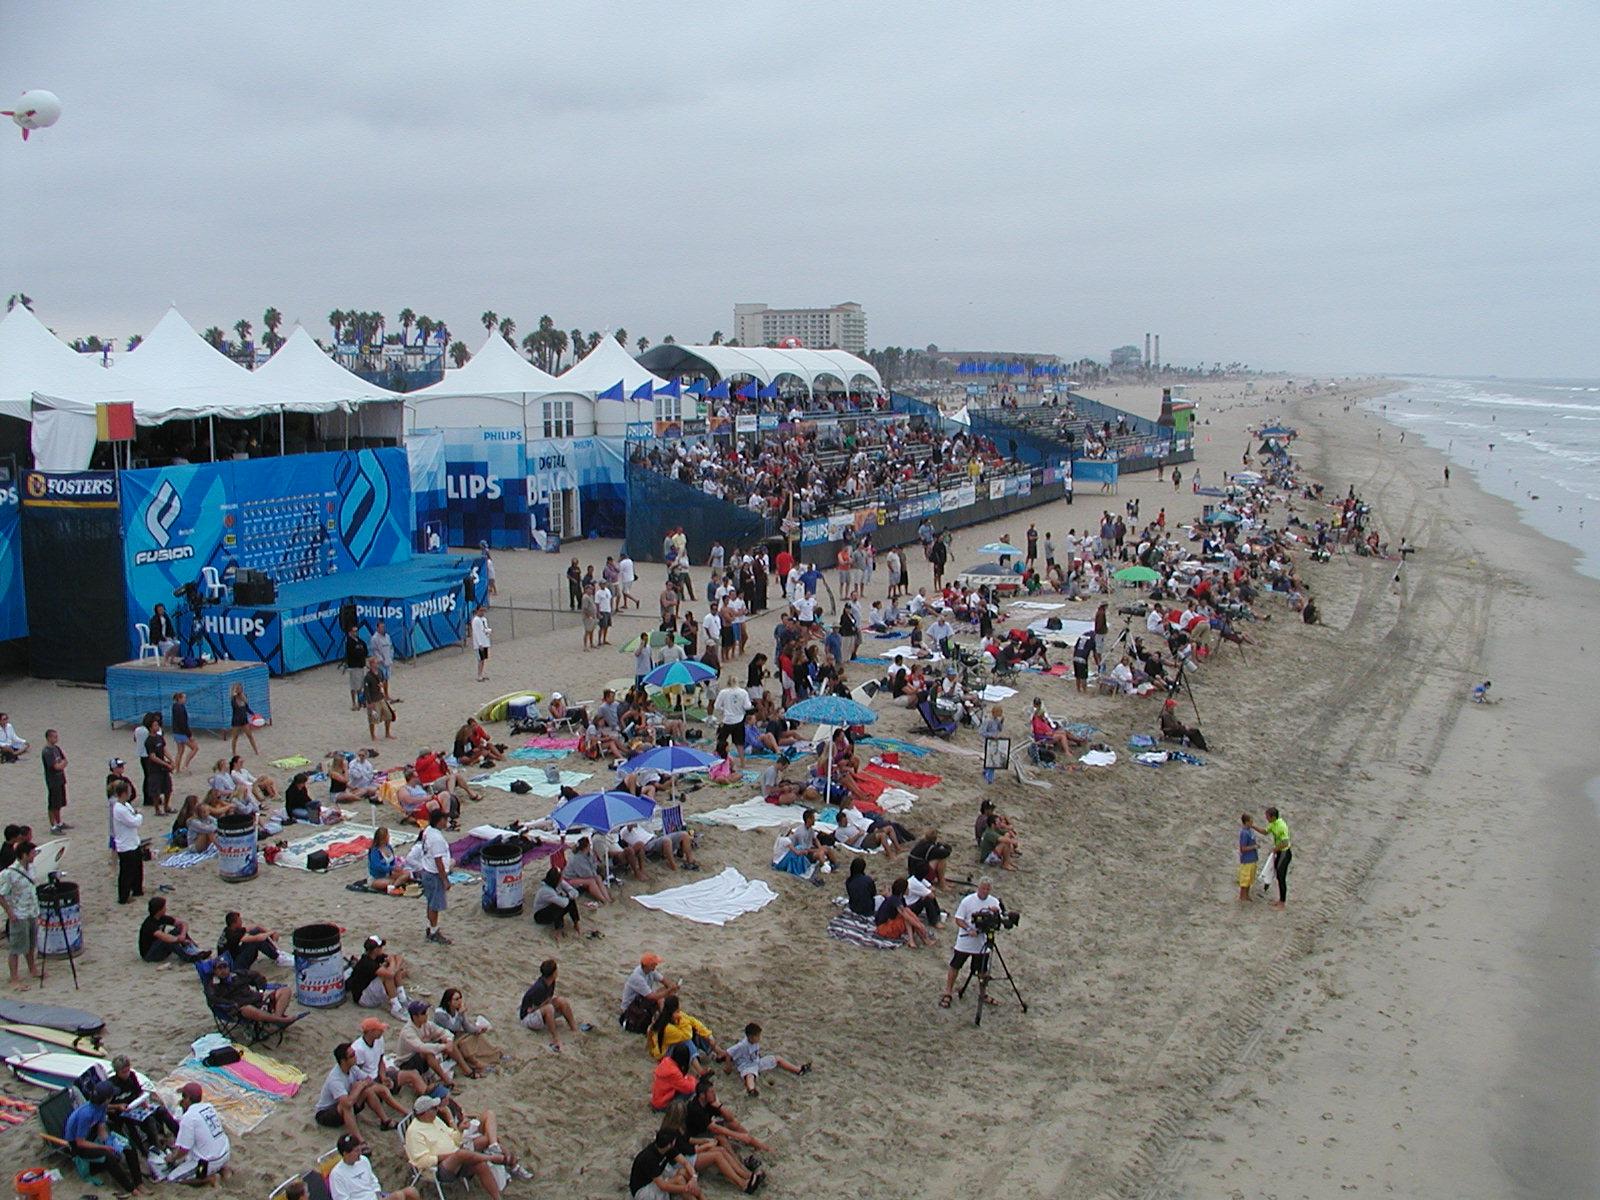 U.S. Open of Surfing in Huntington Beach, Calif. | Las